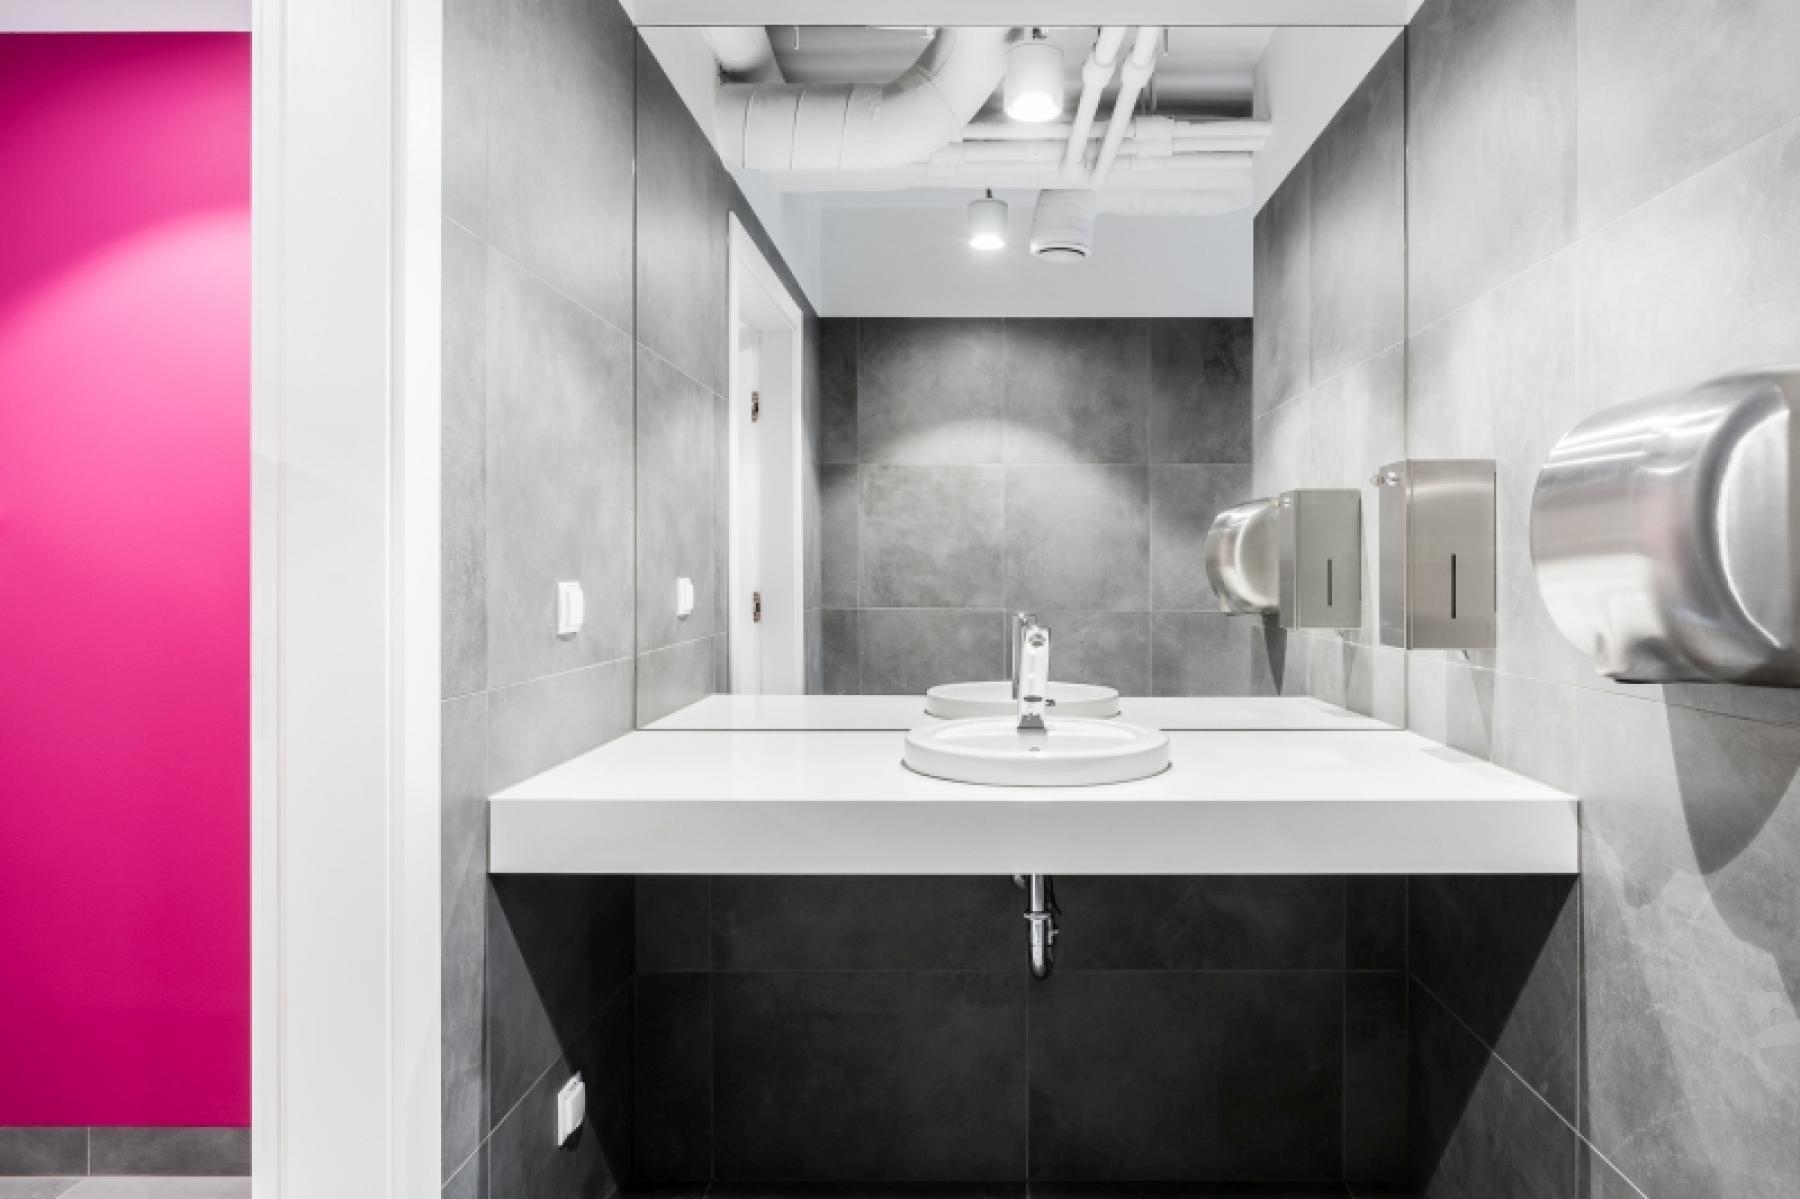 toaleta w biurowcu konstruktorska 11 warszawa